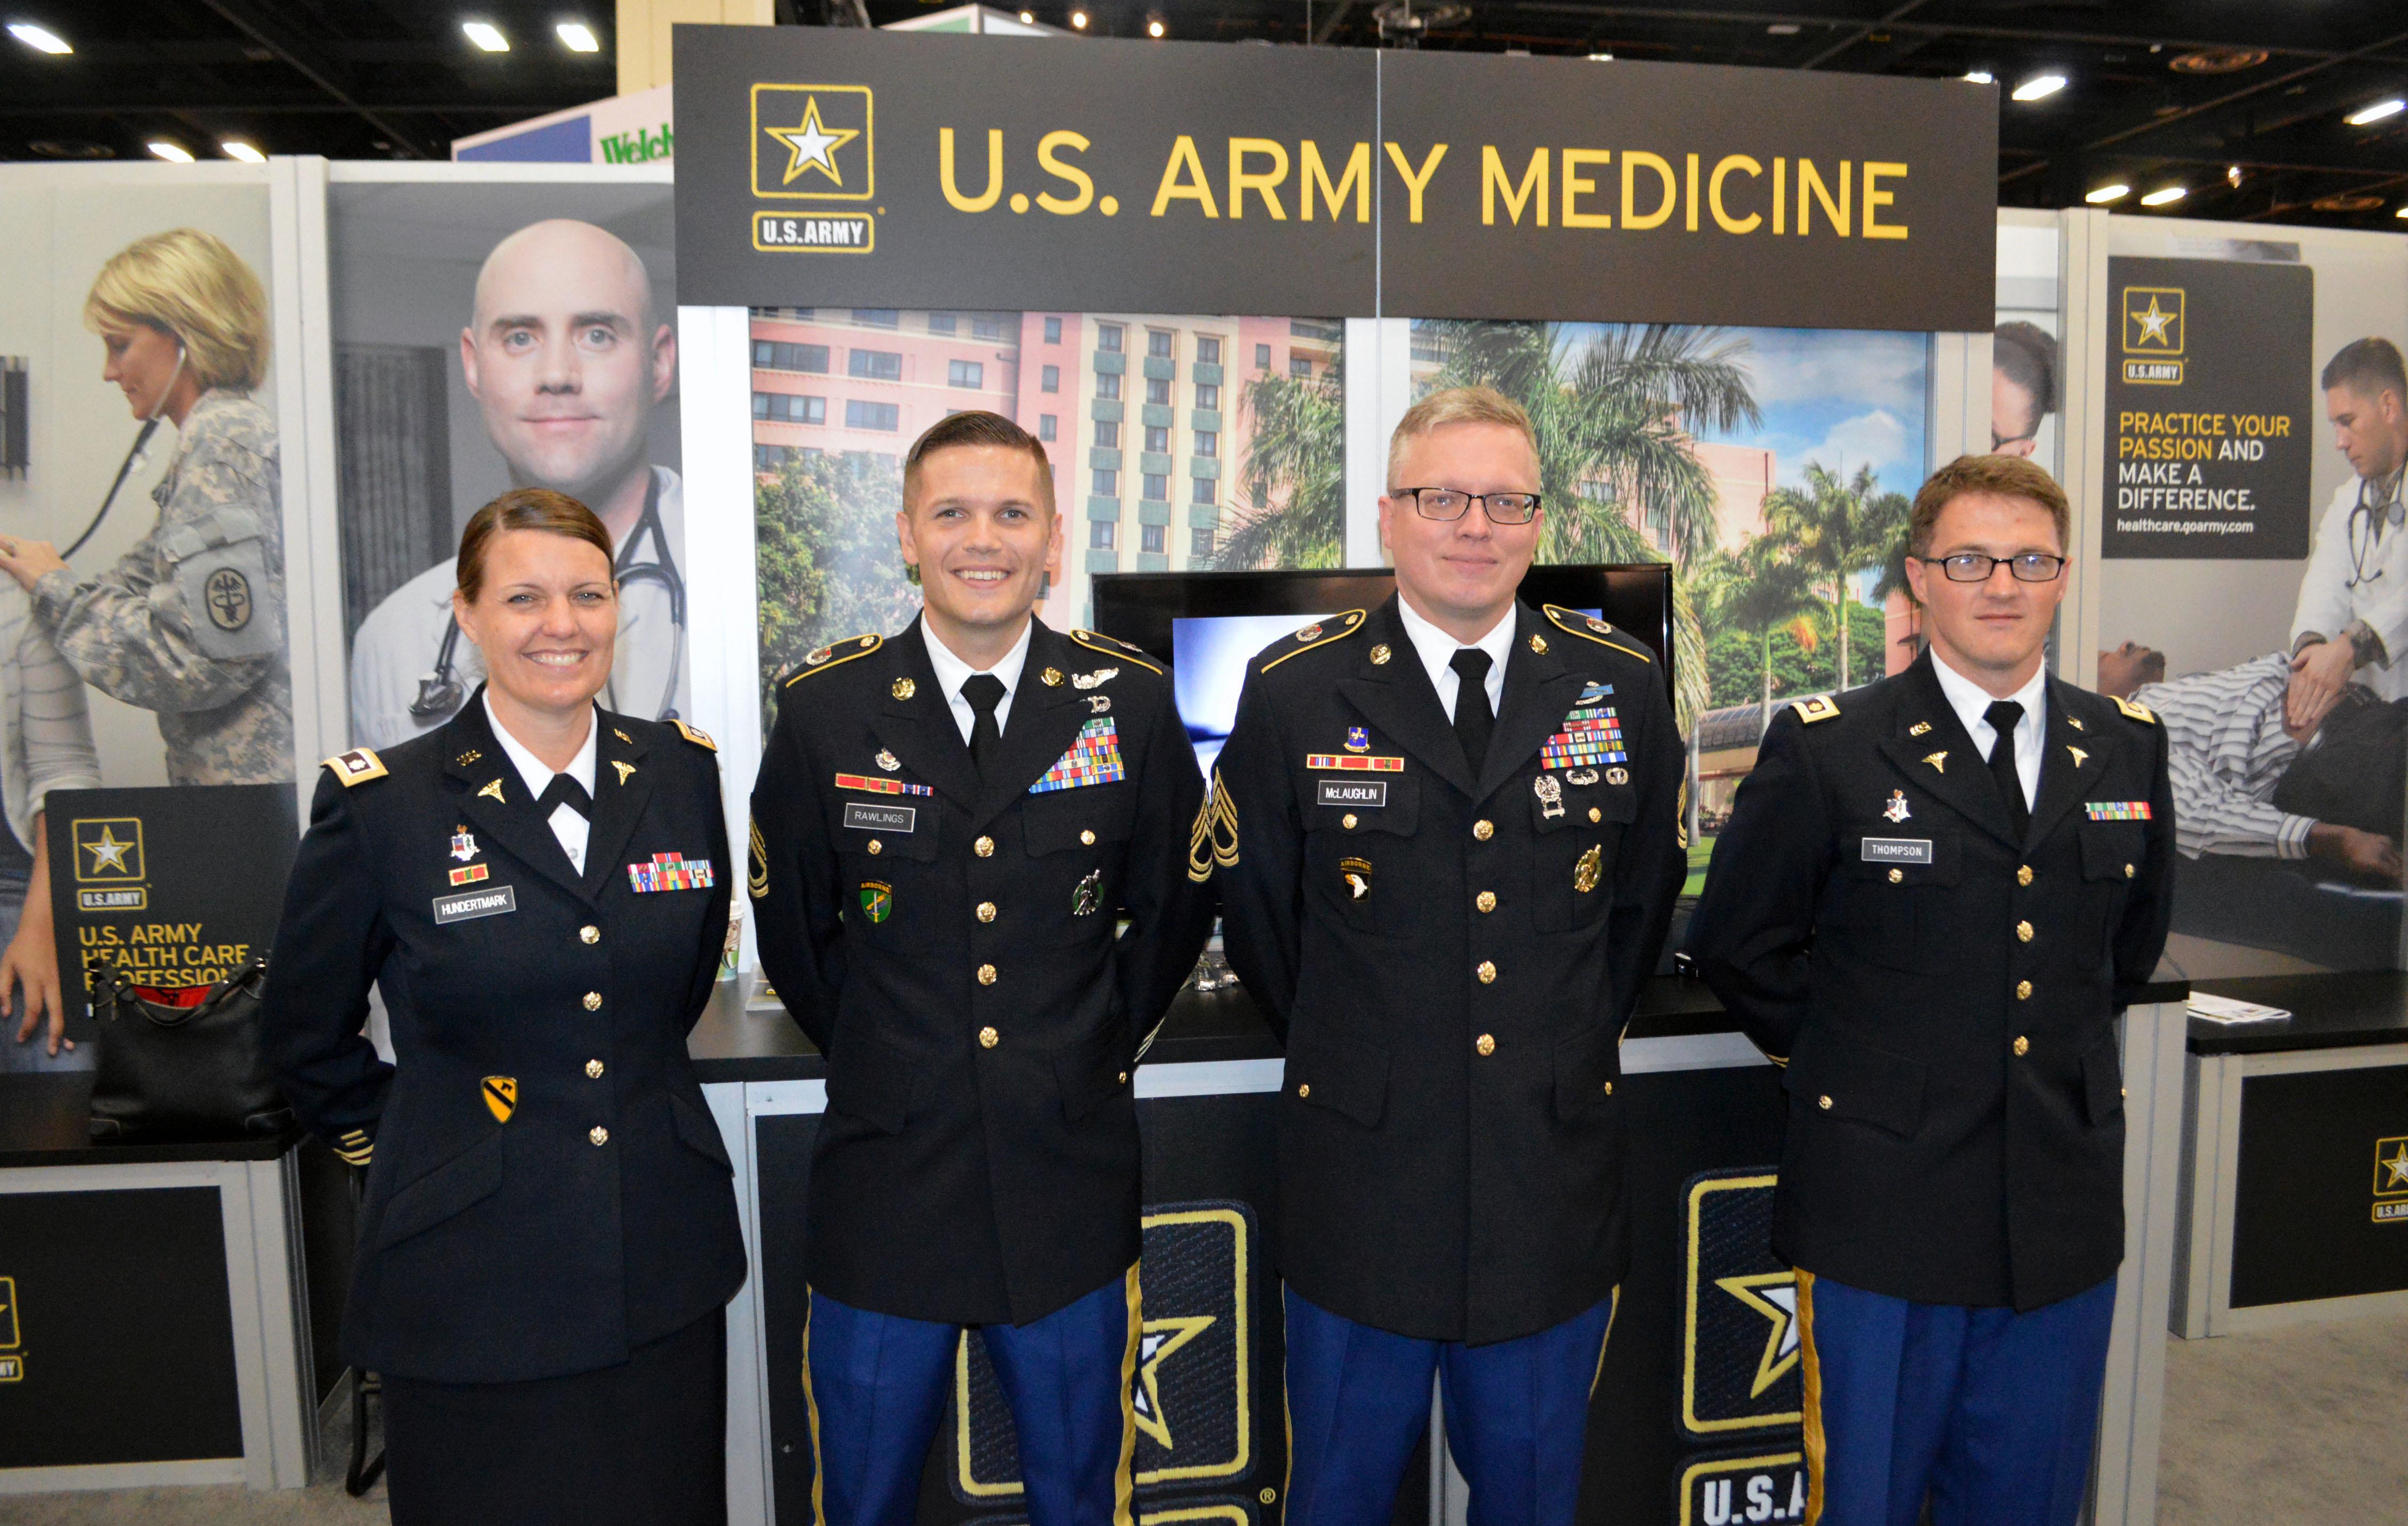 Army Recruiting Teamwork On Display At Major Medical